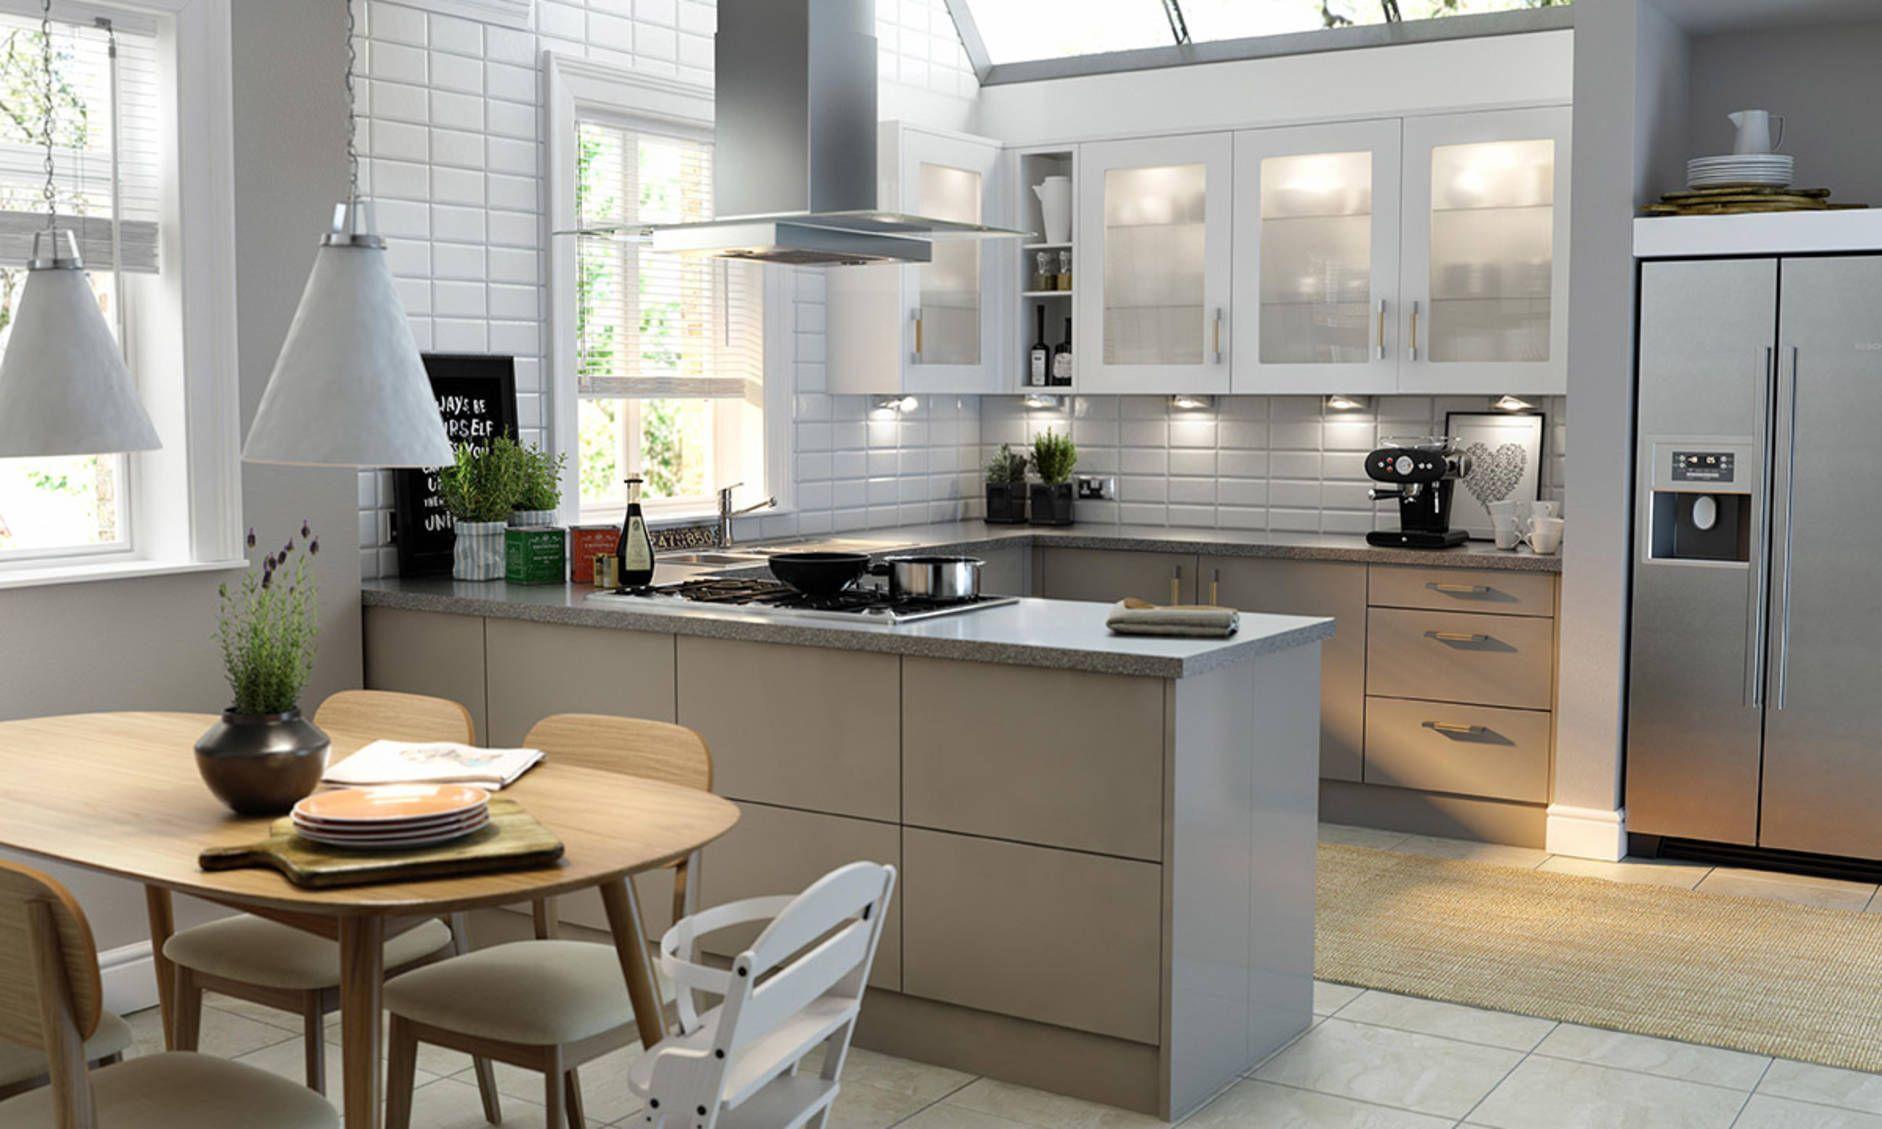 Autograph Stone Grey Gloss Kitchen image 1 (con imágenes